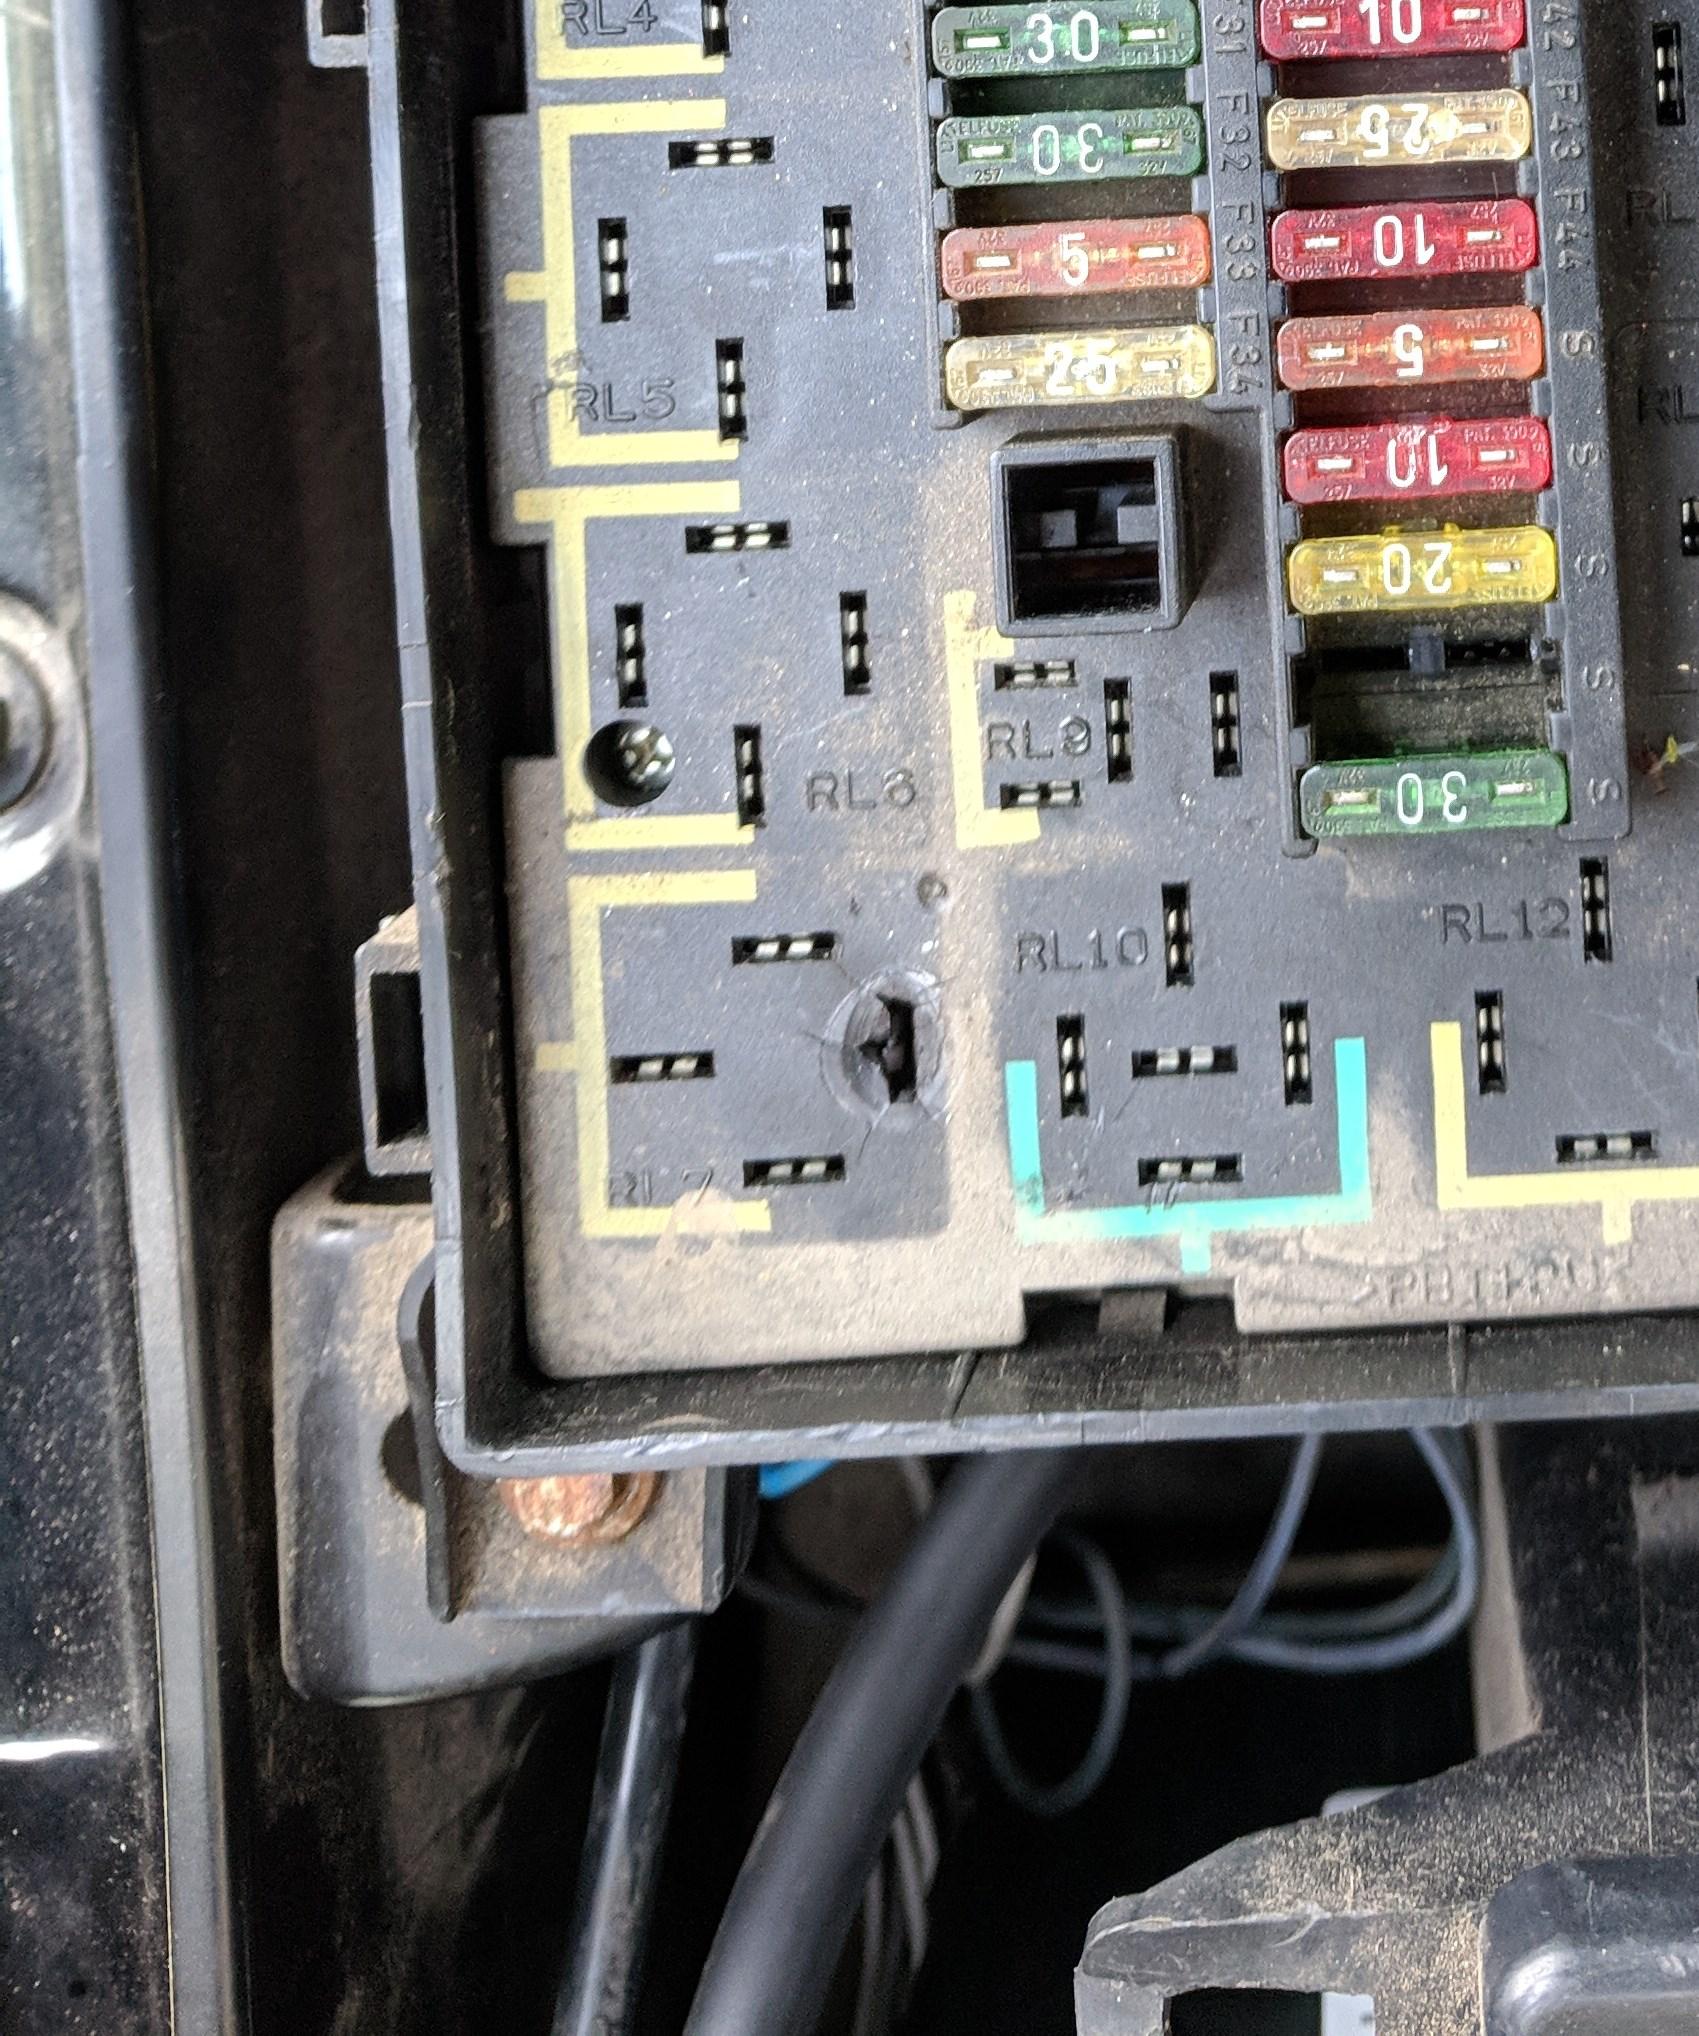 Range Rover P38 My1995 2002 Thesammon F32 Fuse Box Problems